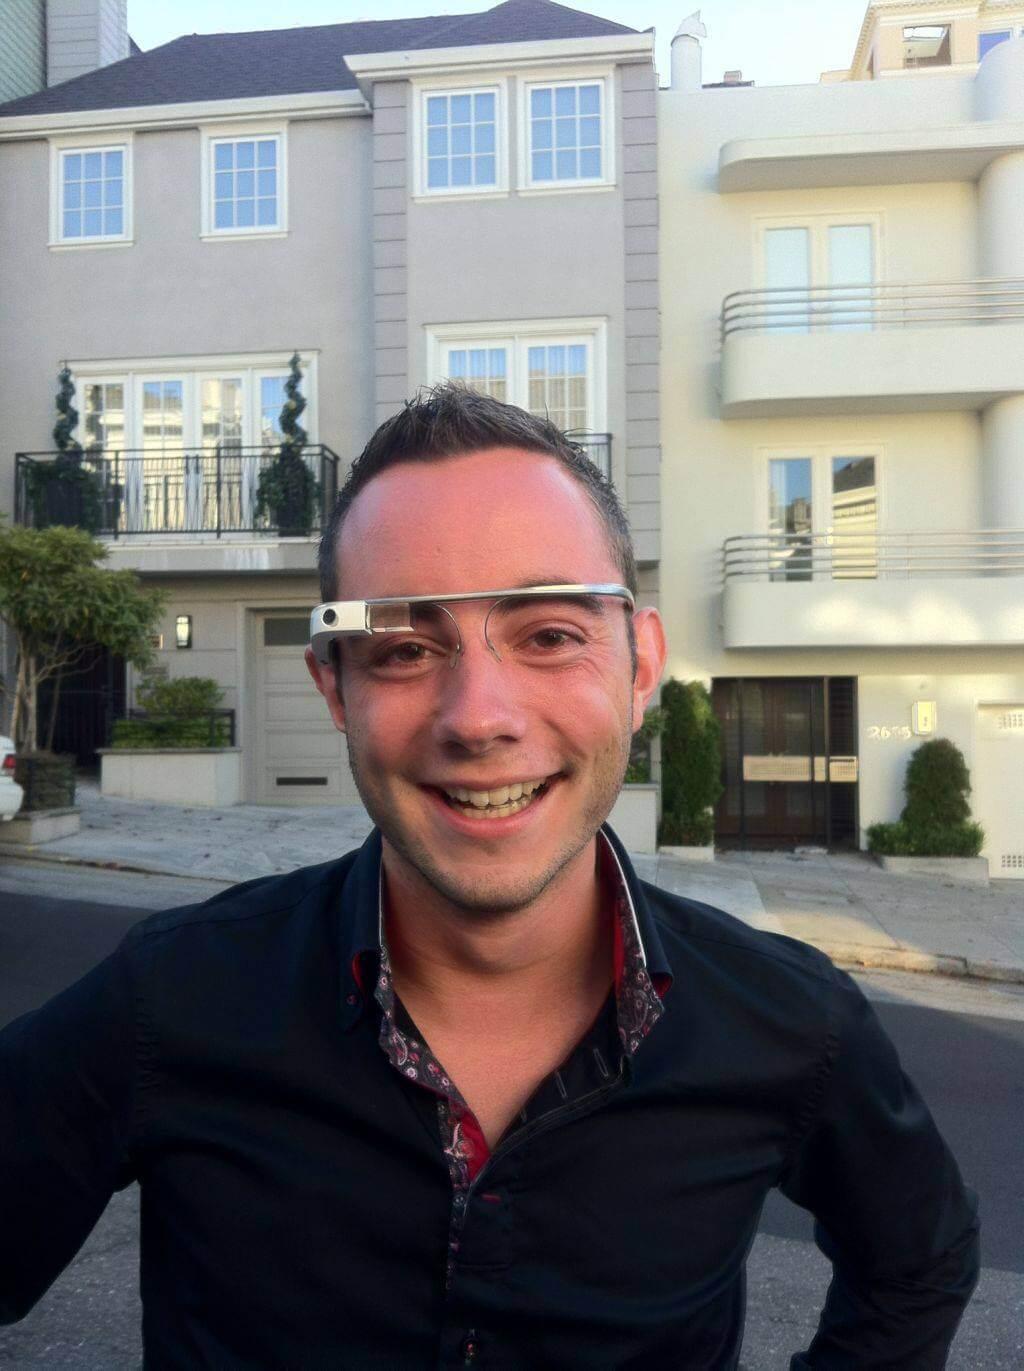 Jim die de Google Glass draagt